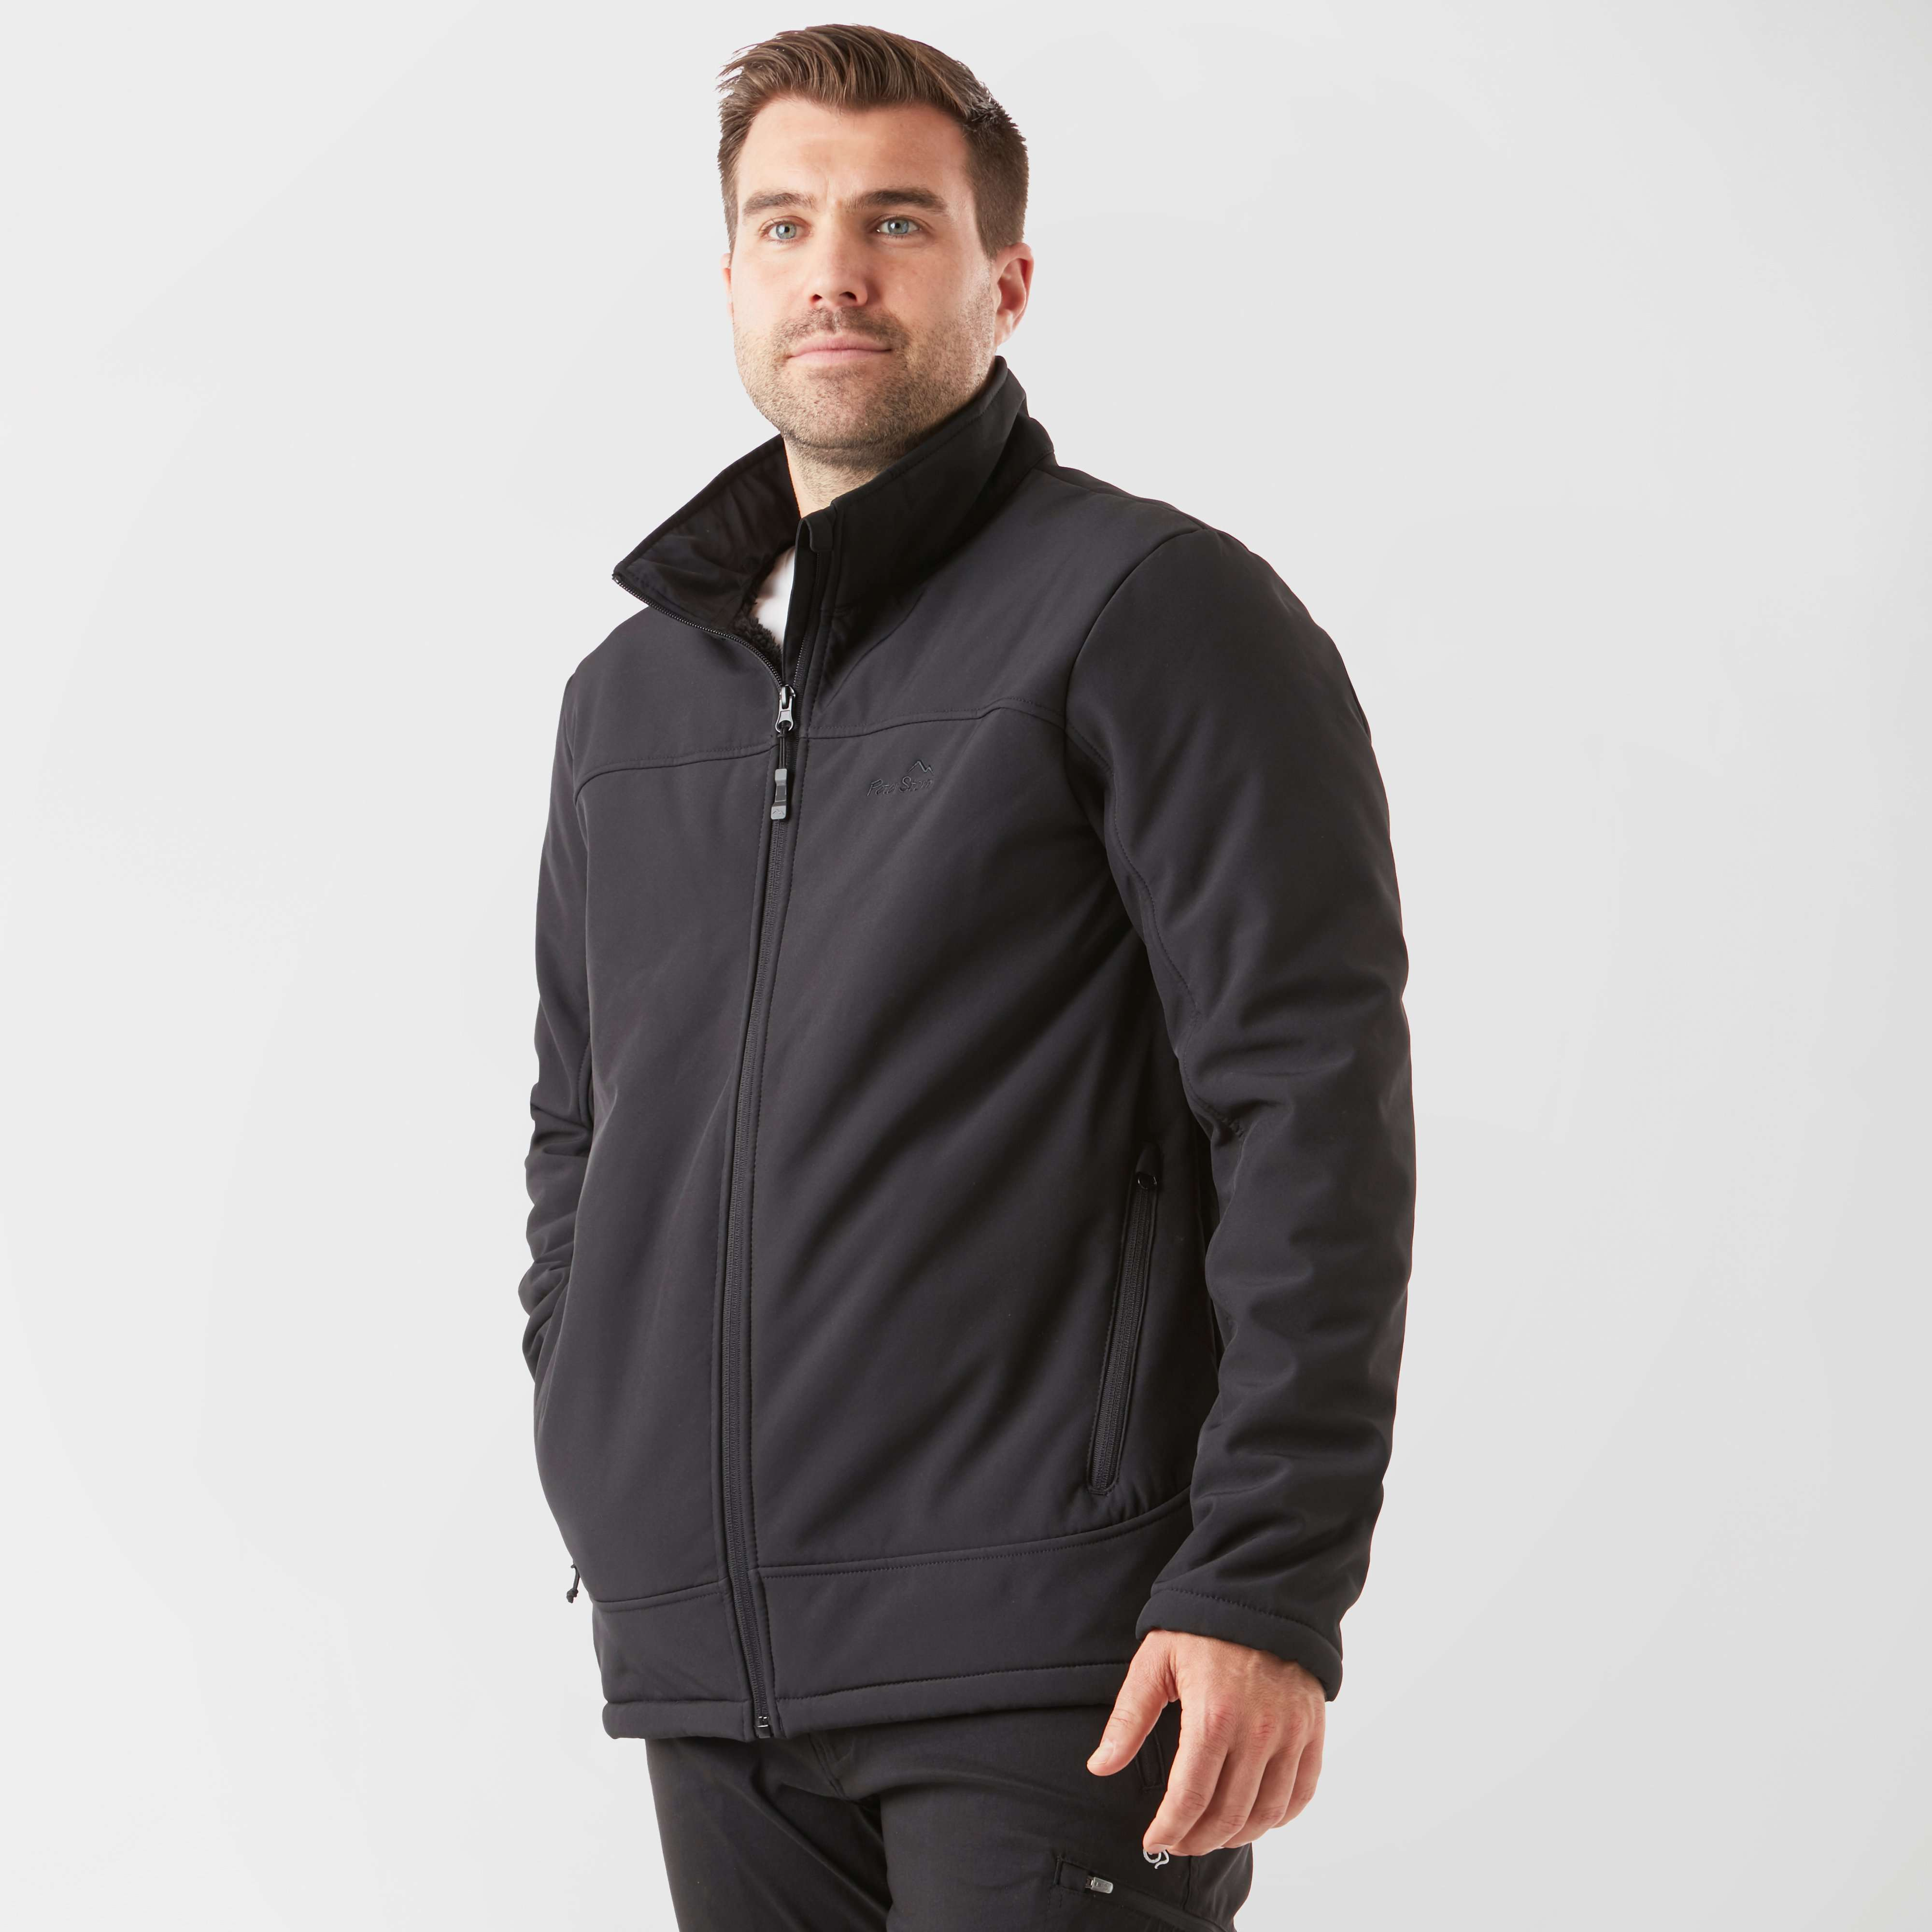 PETER STORM Men's High Loft Softshell Jacket